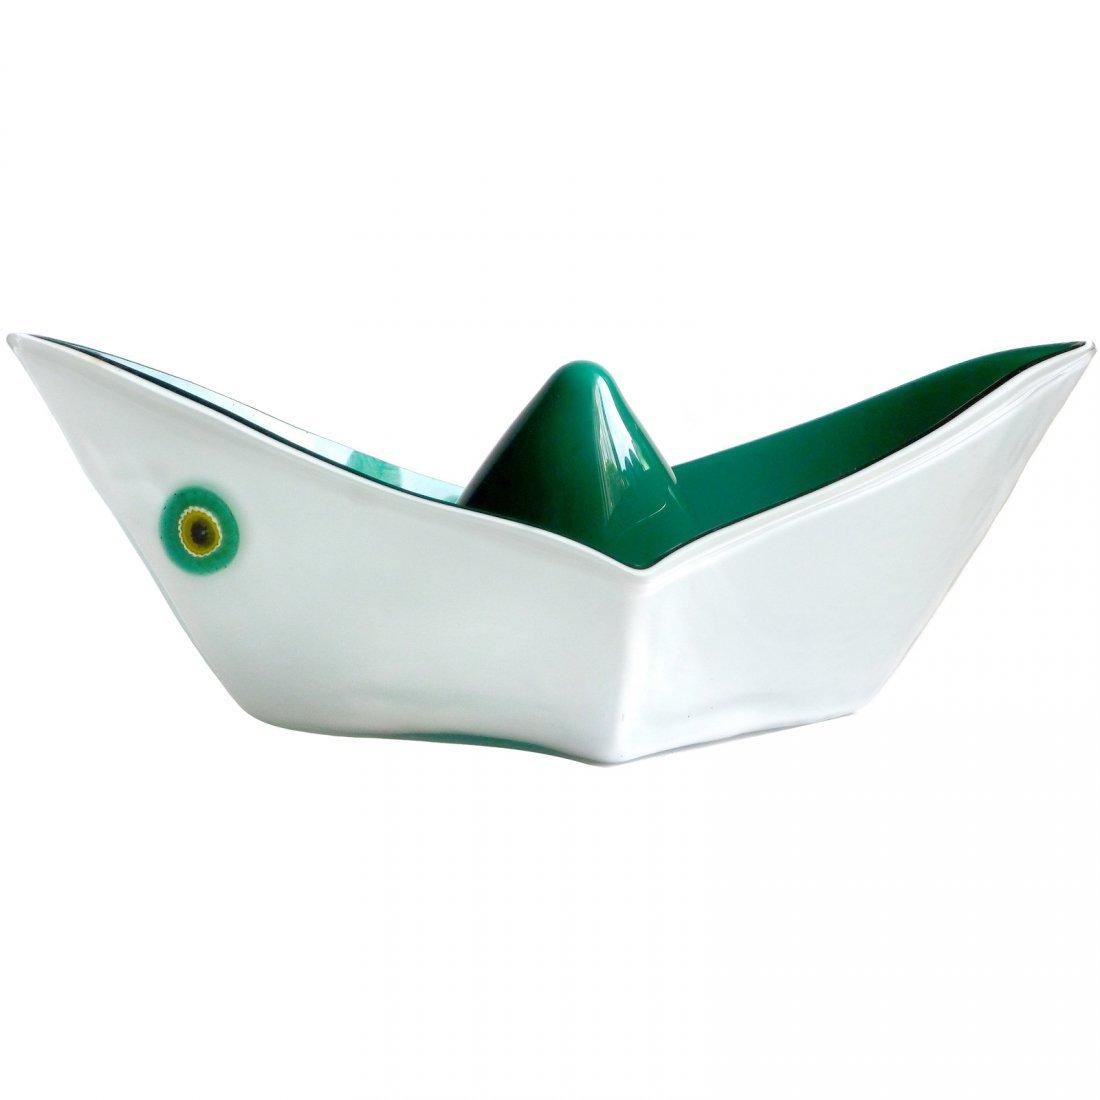 Gino Vistosi Murano 1961 Origami Sculpture